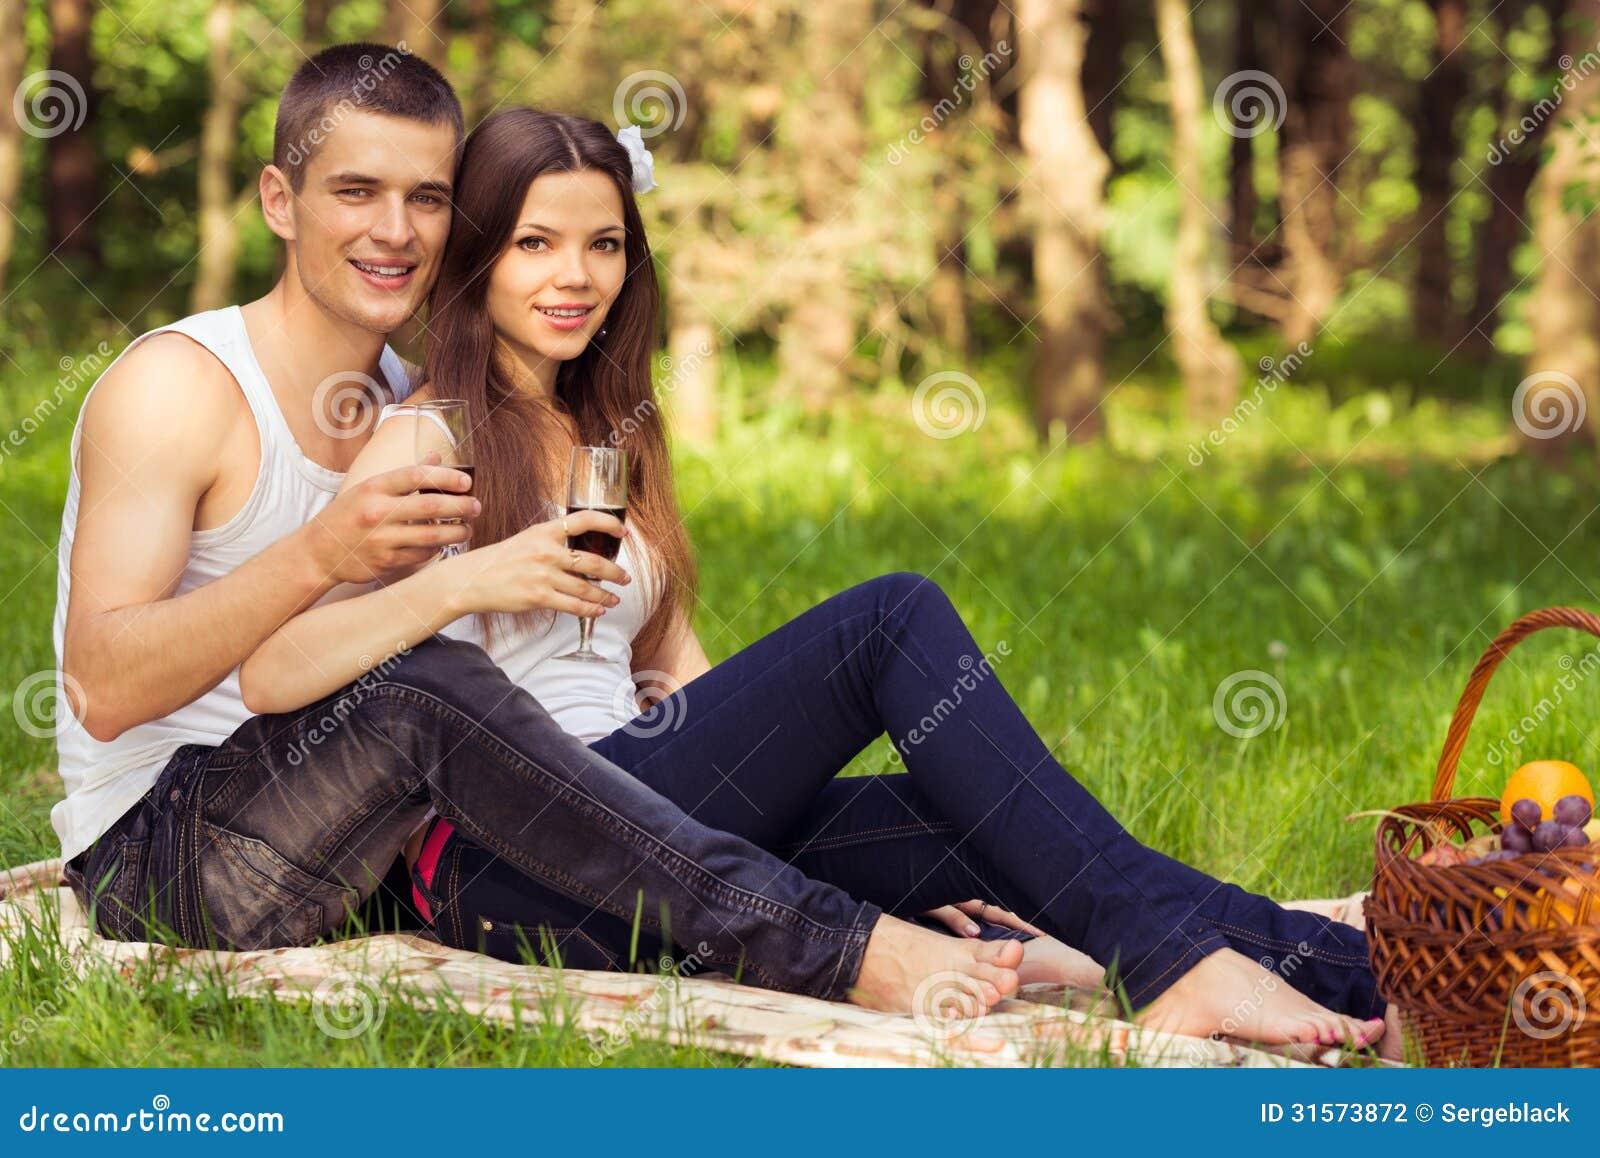 Glasses Of Wine Breastfeeding